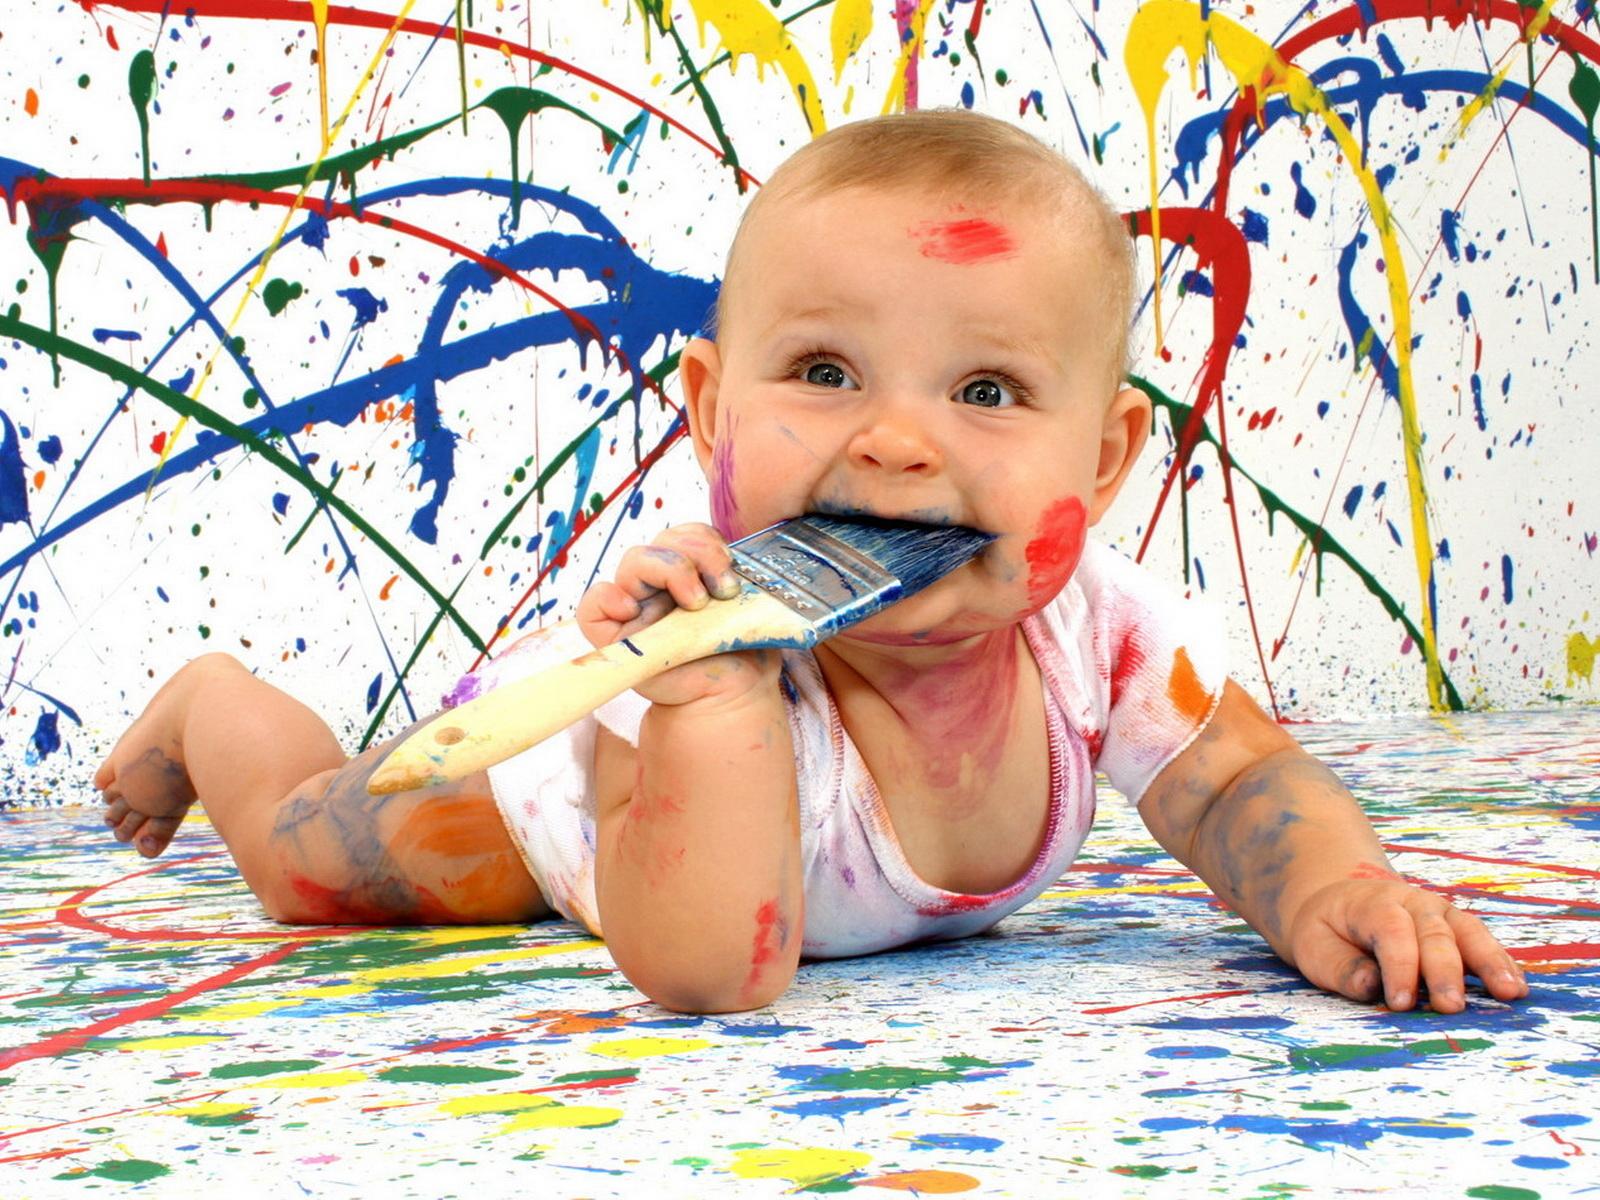 http://lubovj.files.wordpress.com/2011/12/18415-desktop-wallpapers-child.jpg